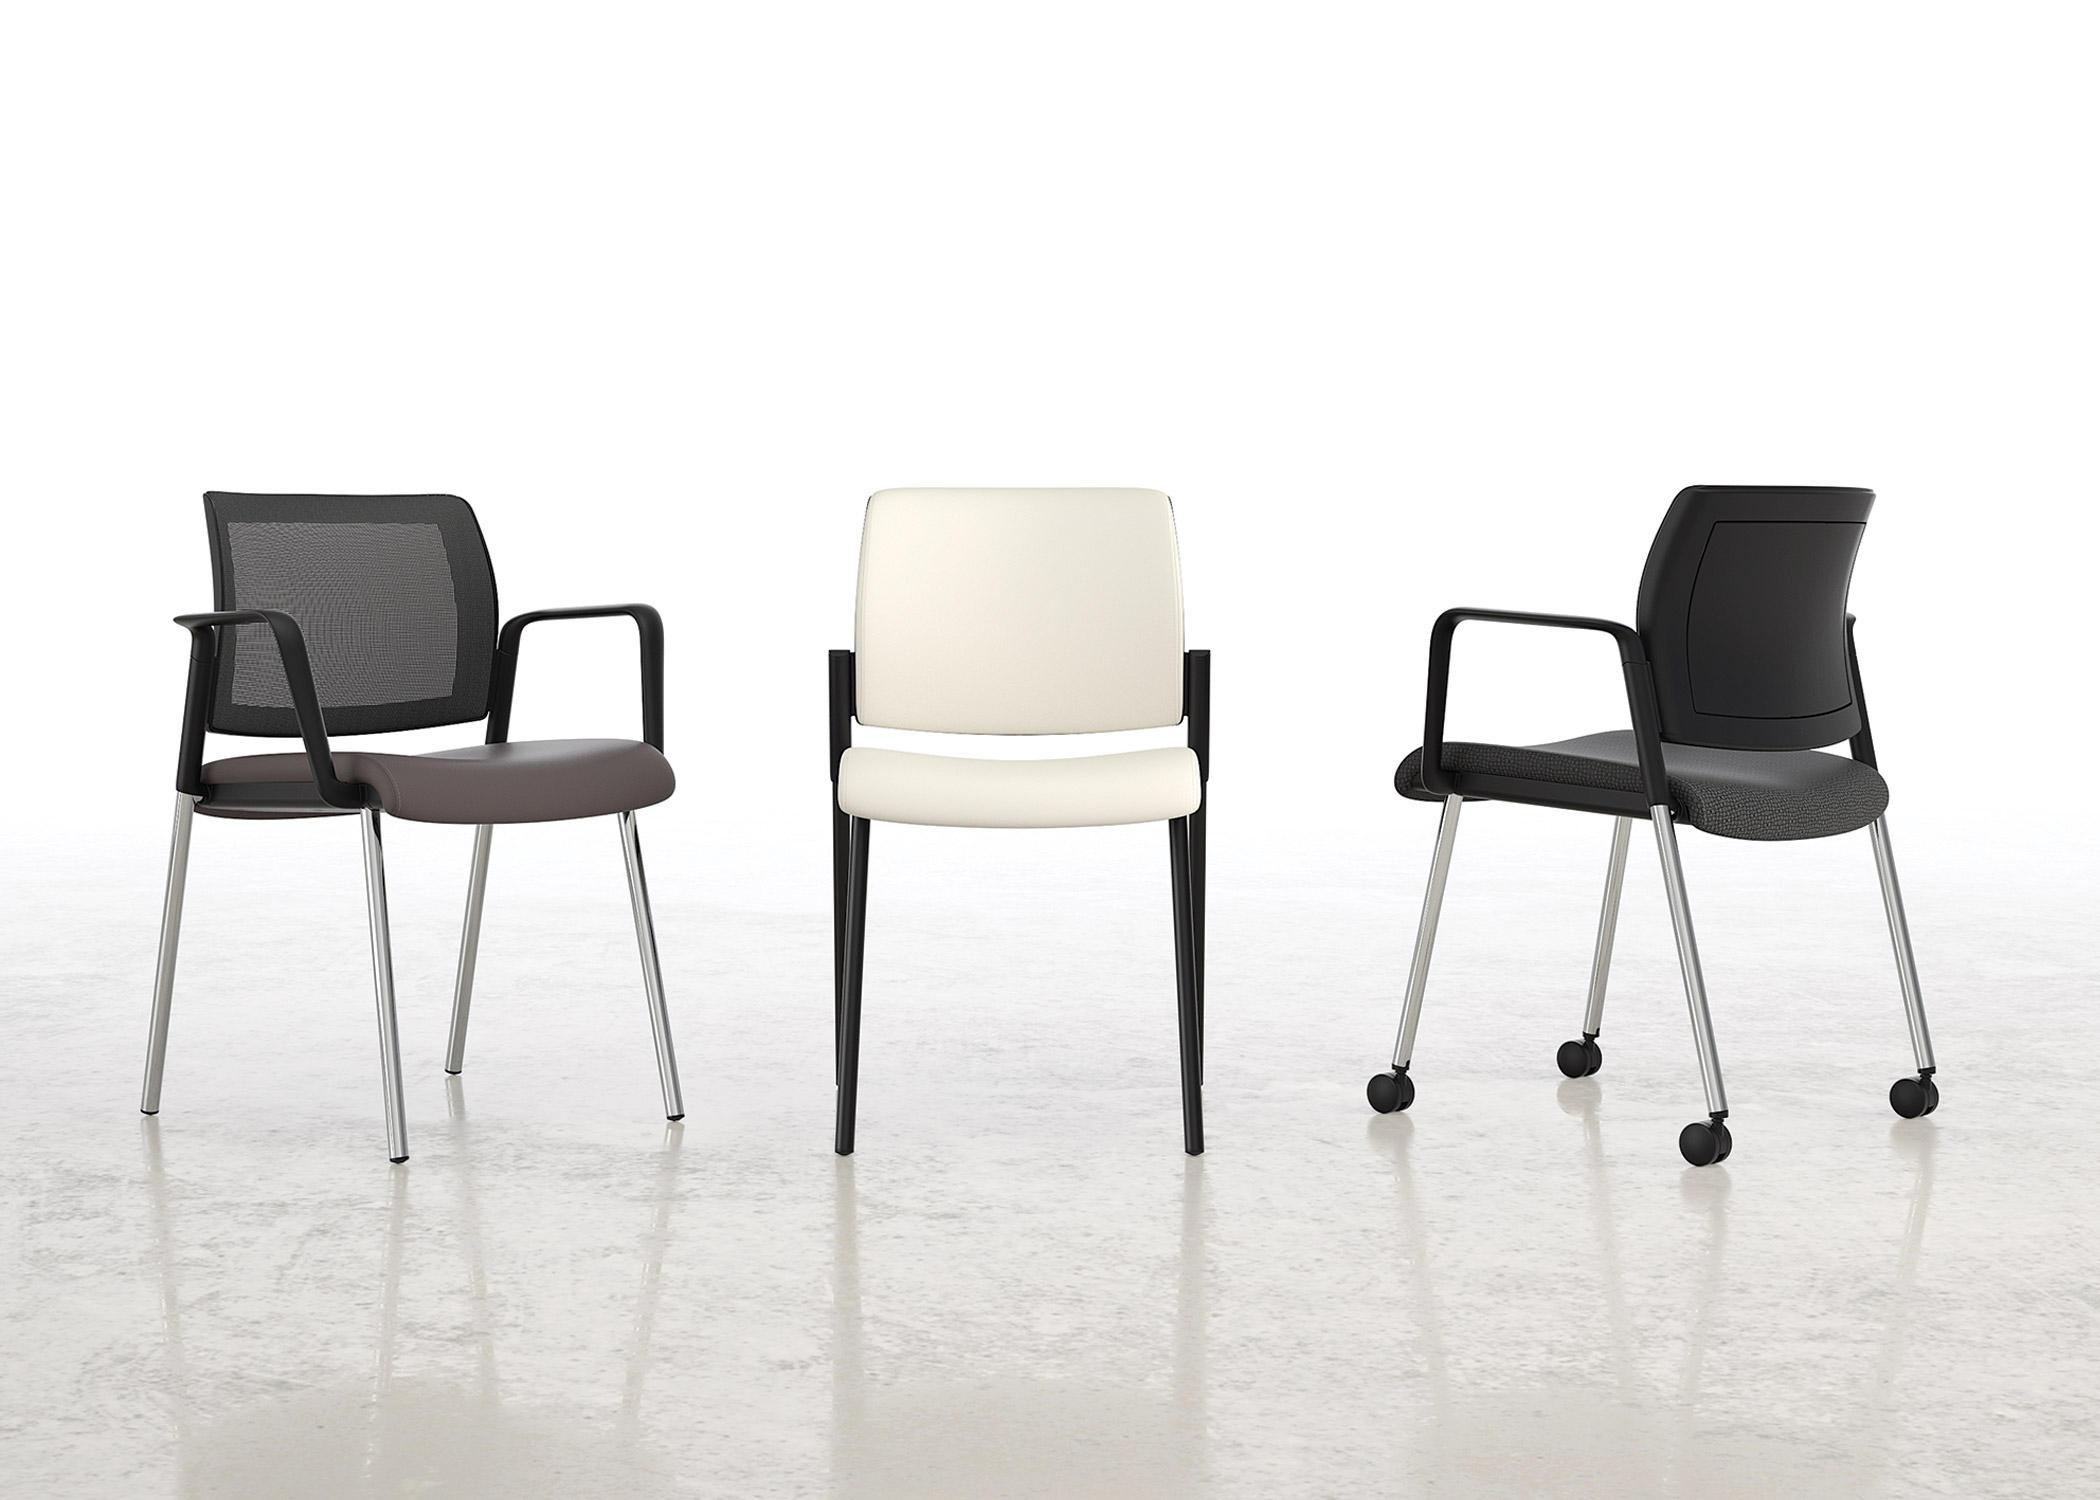 lavoro guest chair with upholstered back plastic seat mobile besucherst hle von national. Black Bedroom Furniture Sets. Home Design Ideas